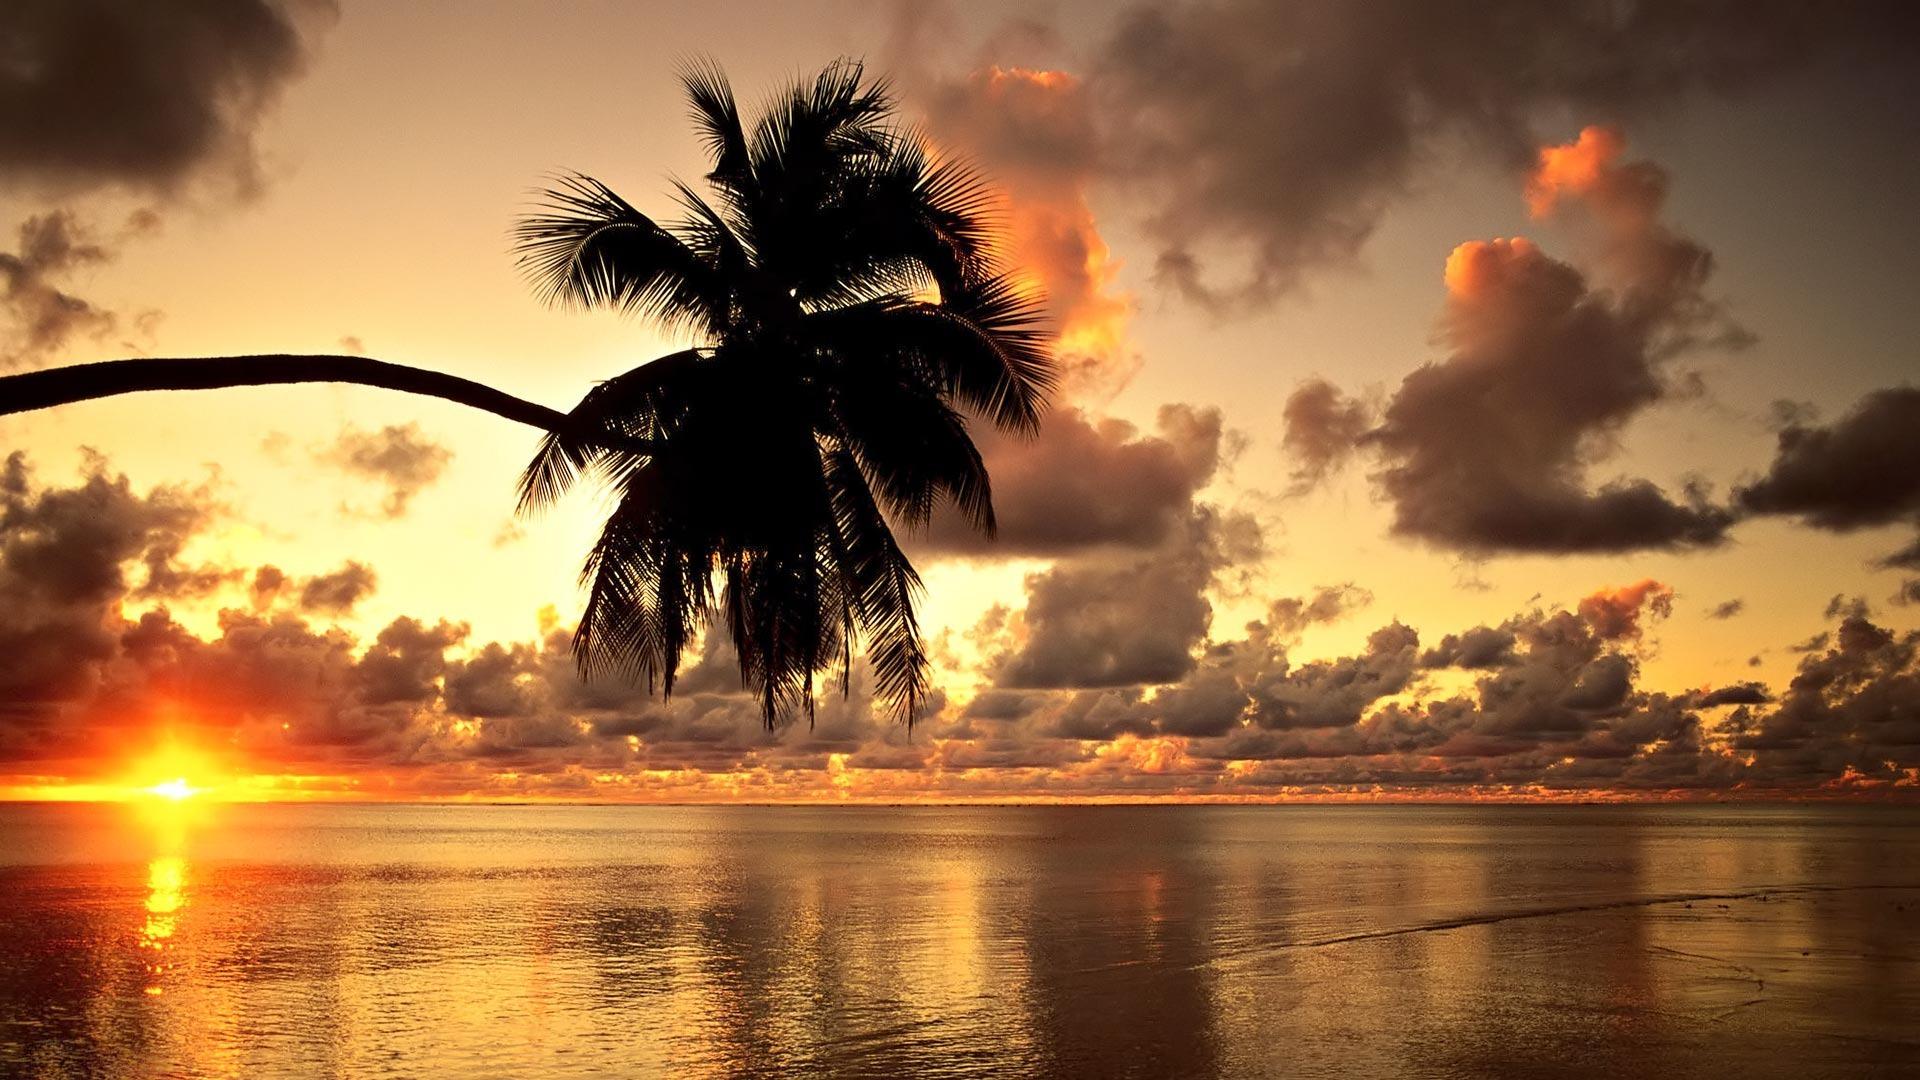 Hawaiian Sunset HD Beach Wallpapers 1080p | HD Wallpapers Source